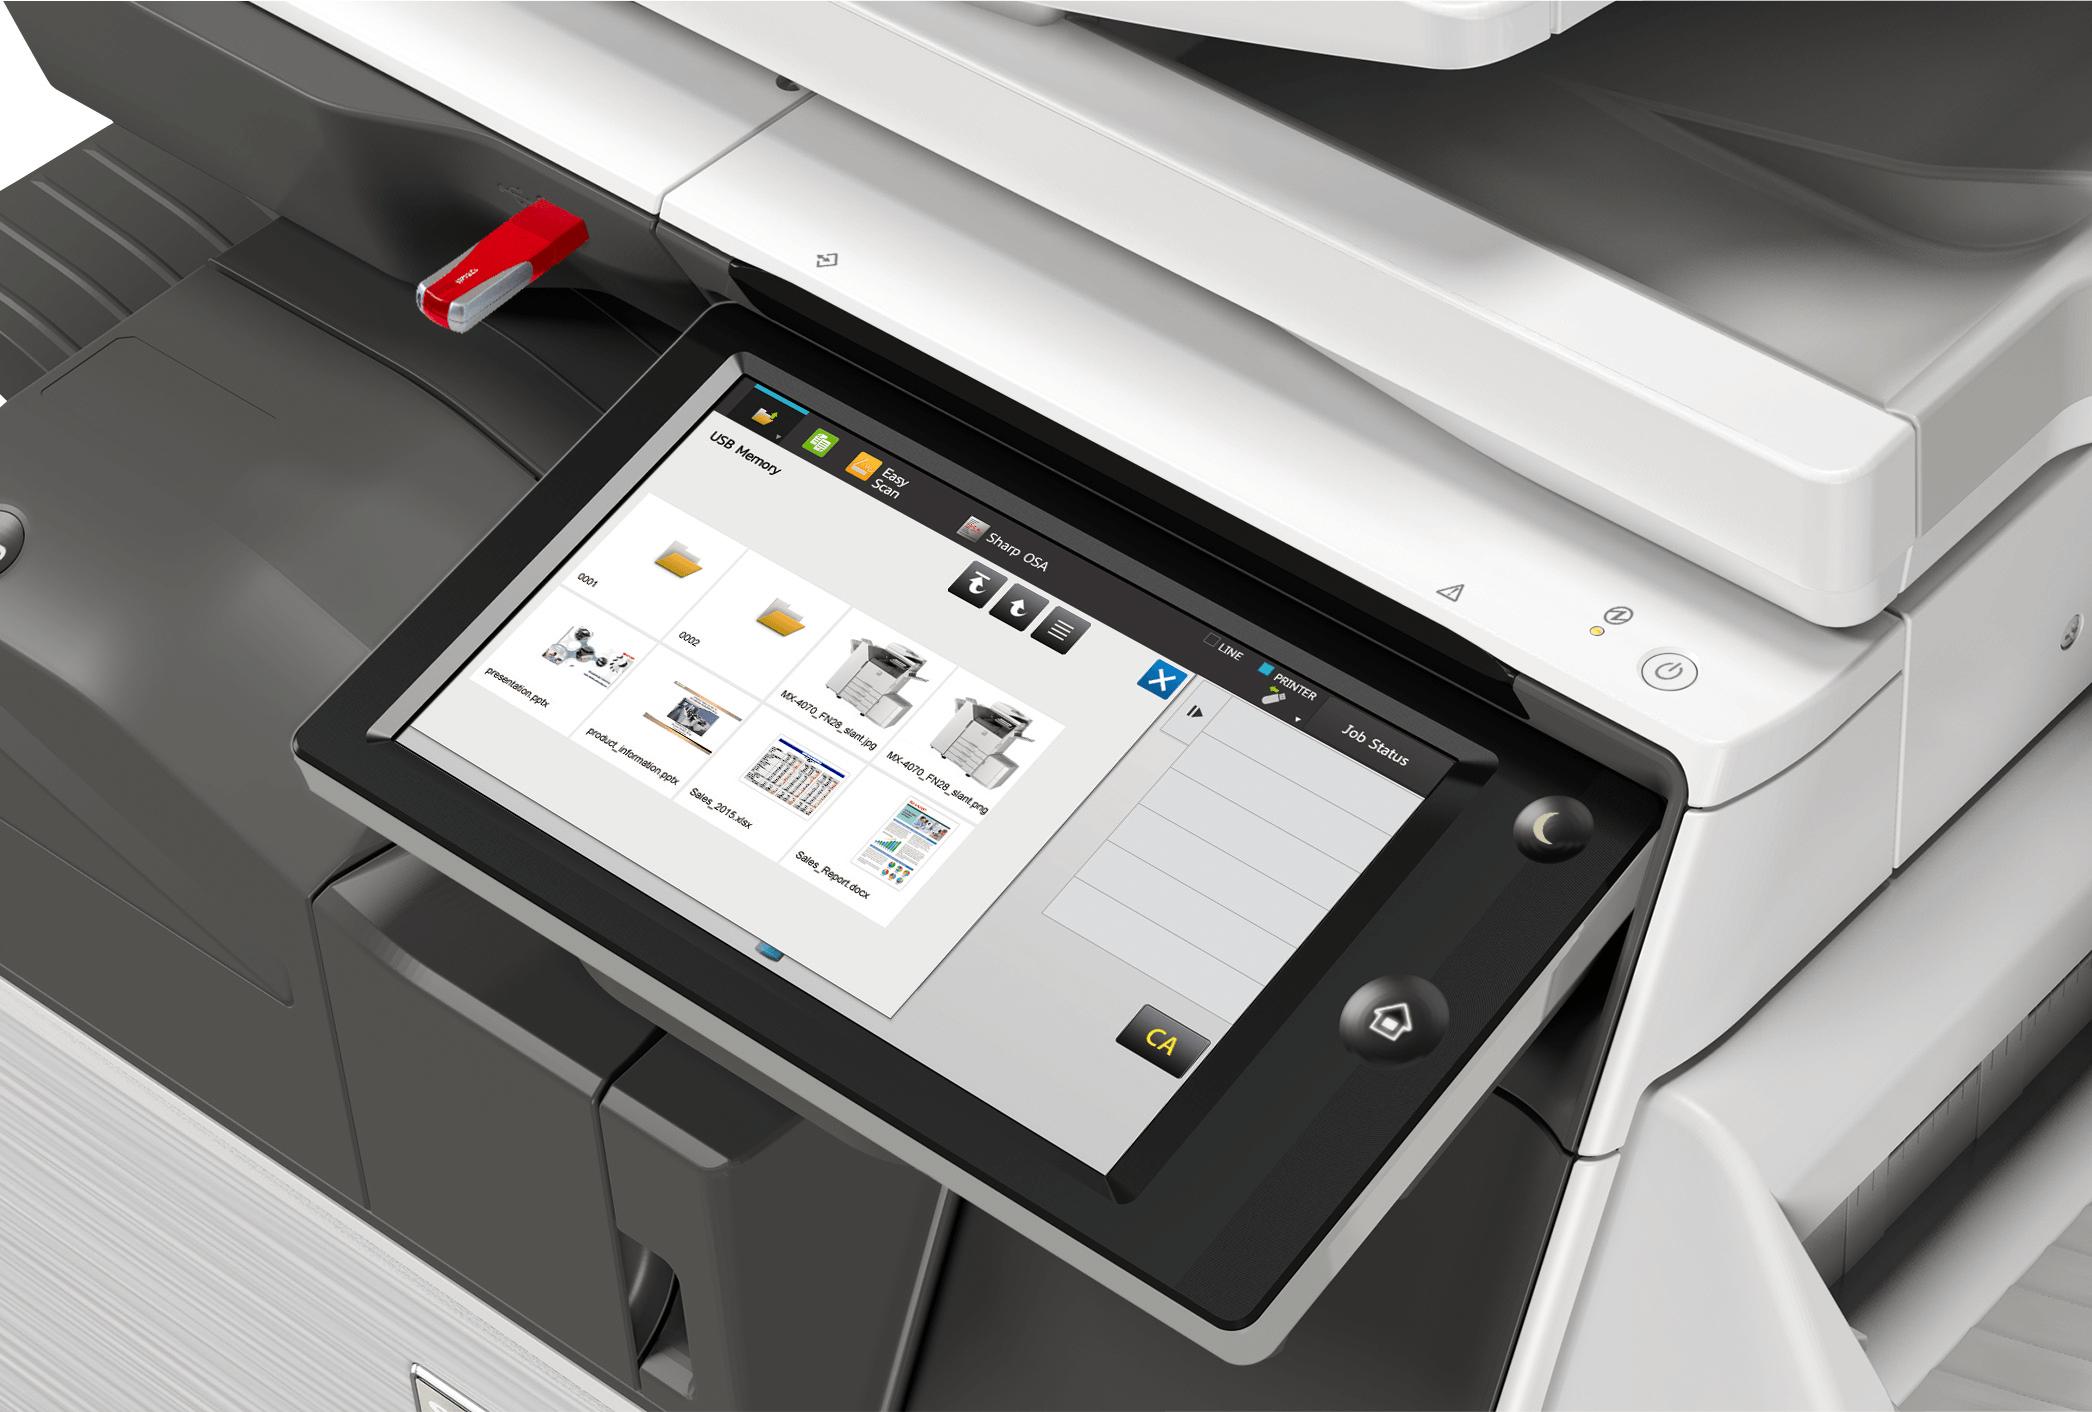 Sharp photocopier touch screen